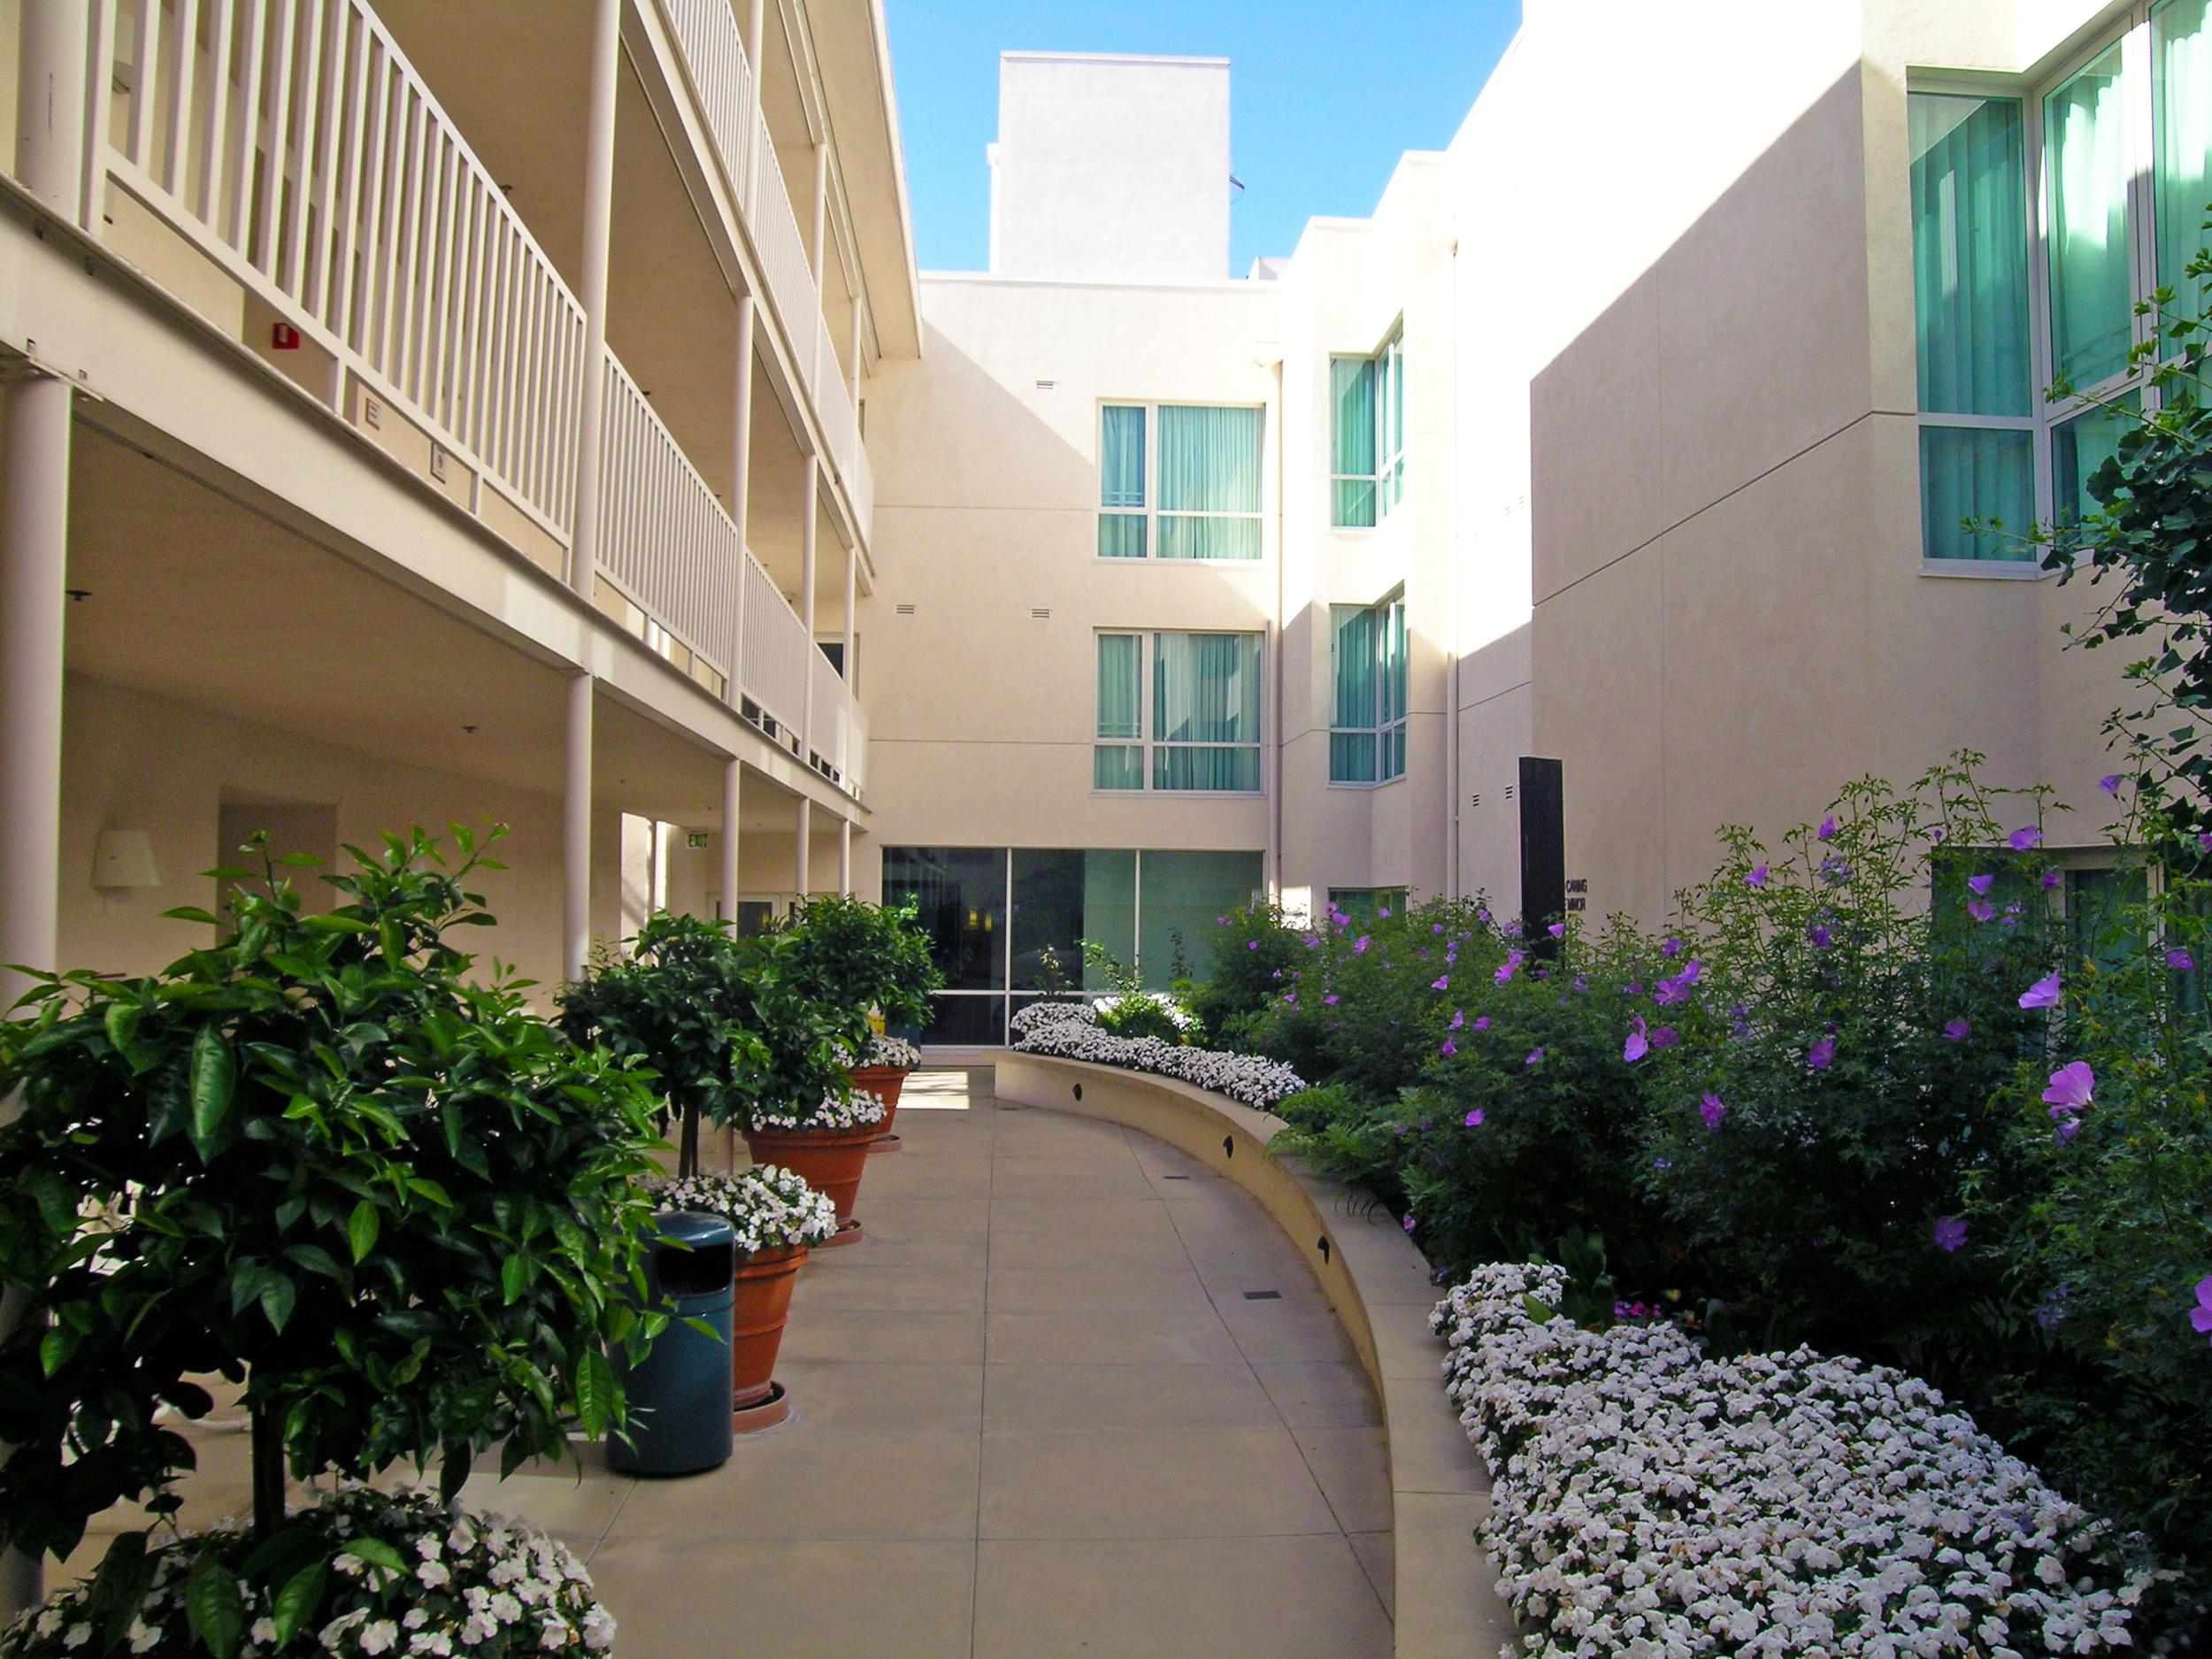 Courtyard1-edit.jpg